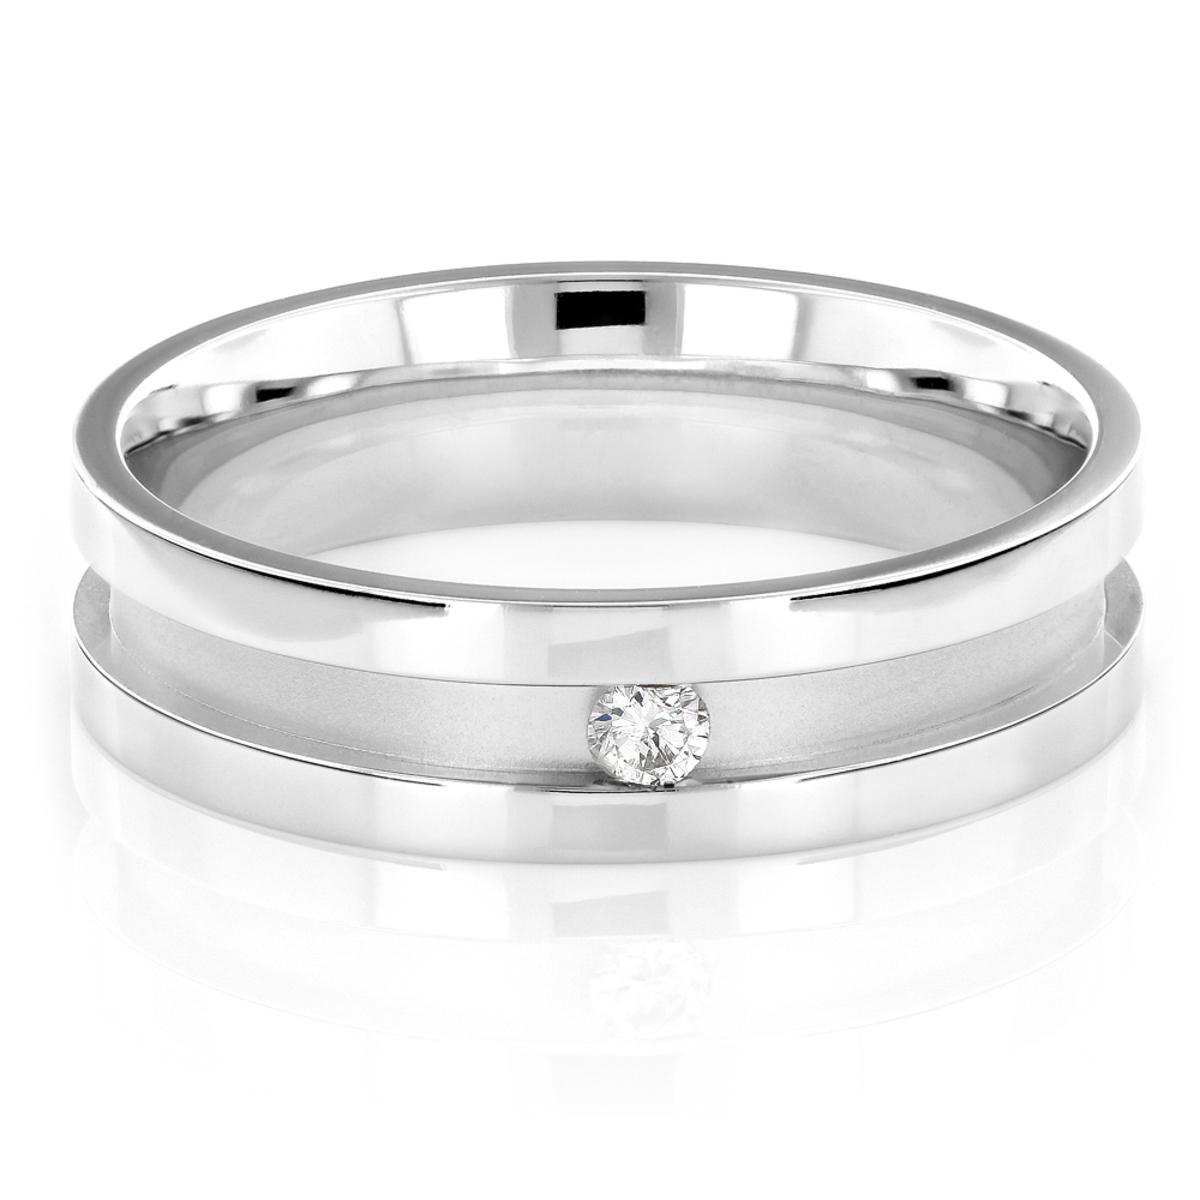 Mens Diamond Wedding Band Engagement Ring 0.1ct 14K Gold Comfort Fit